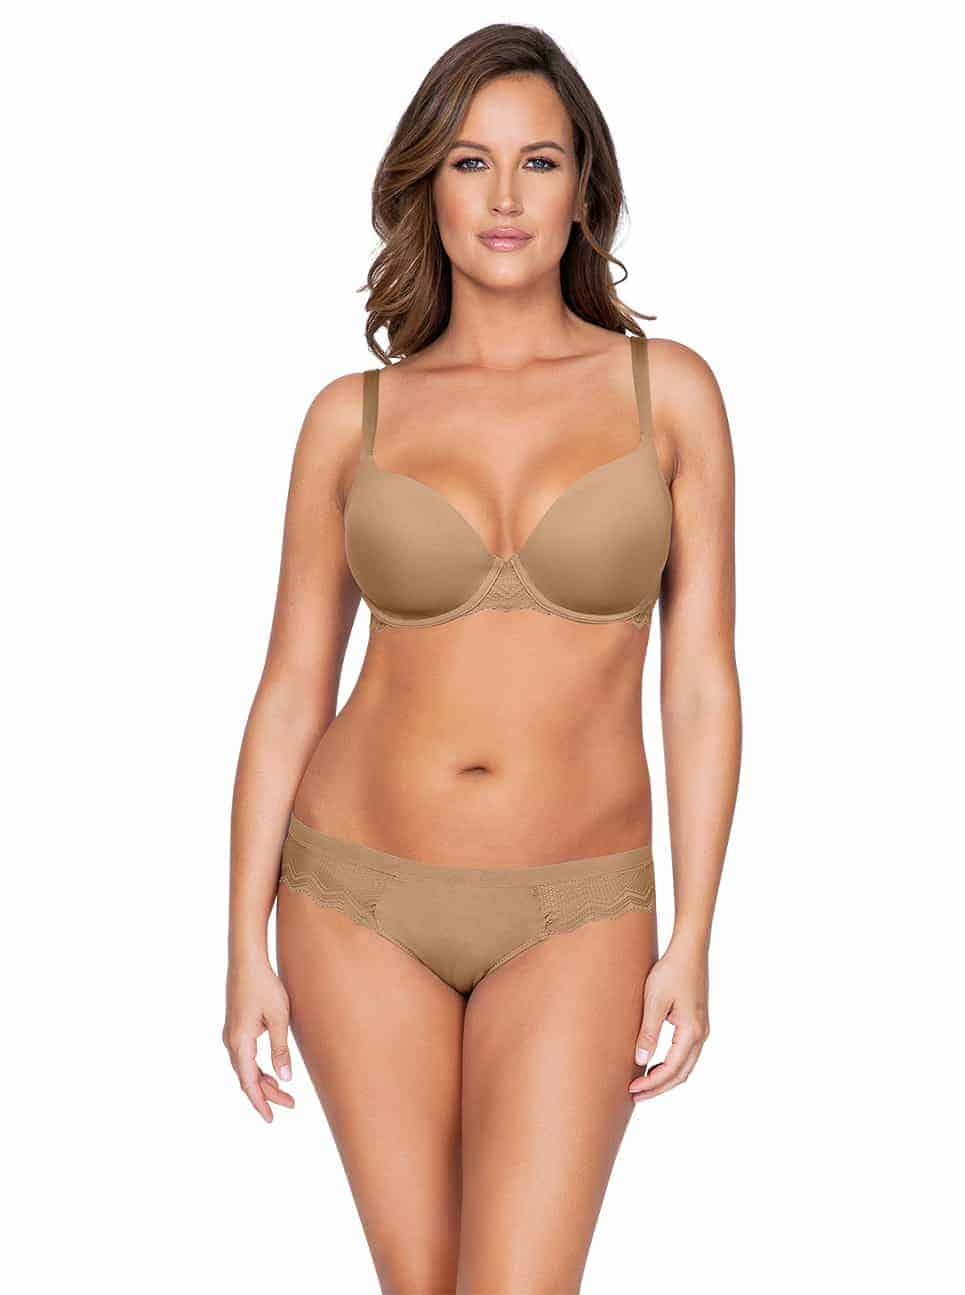 Lydie P5441ContourPadded P5443 Bikini NudeFront copy - Lydie Contour Padded Bra – European Nude – P5441